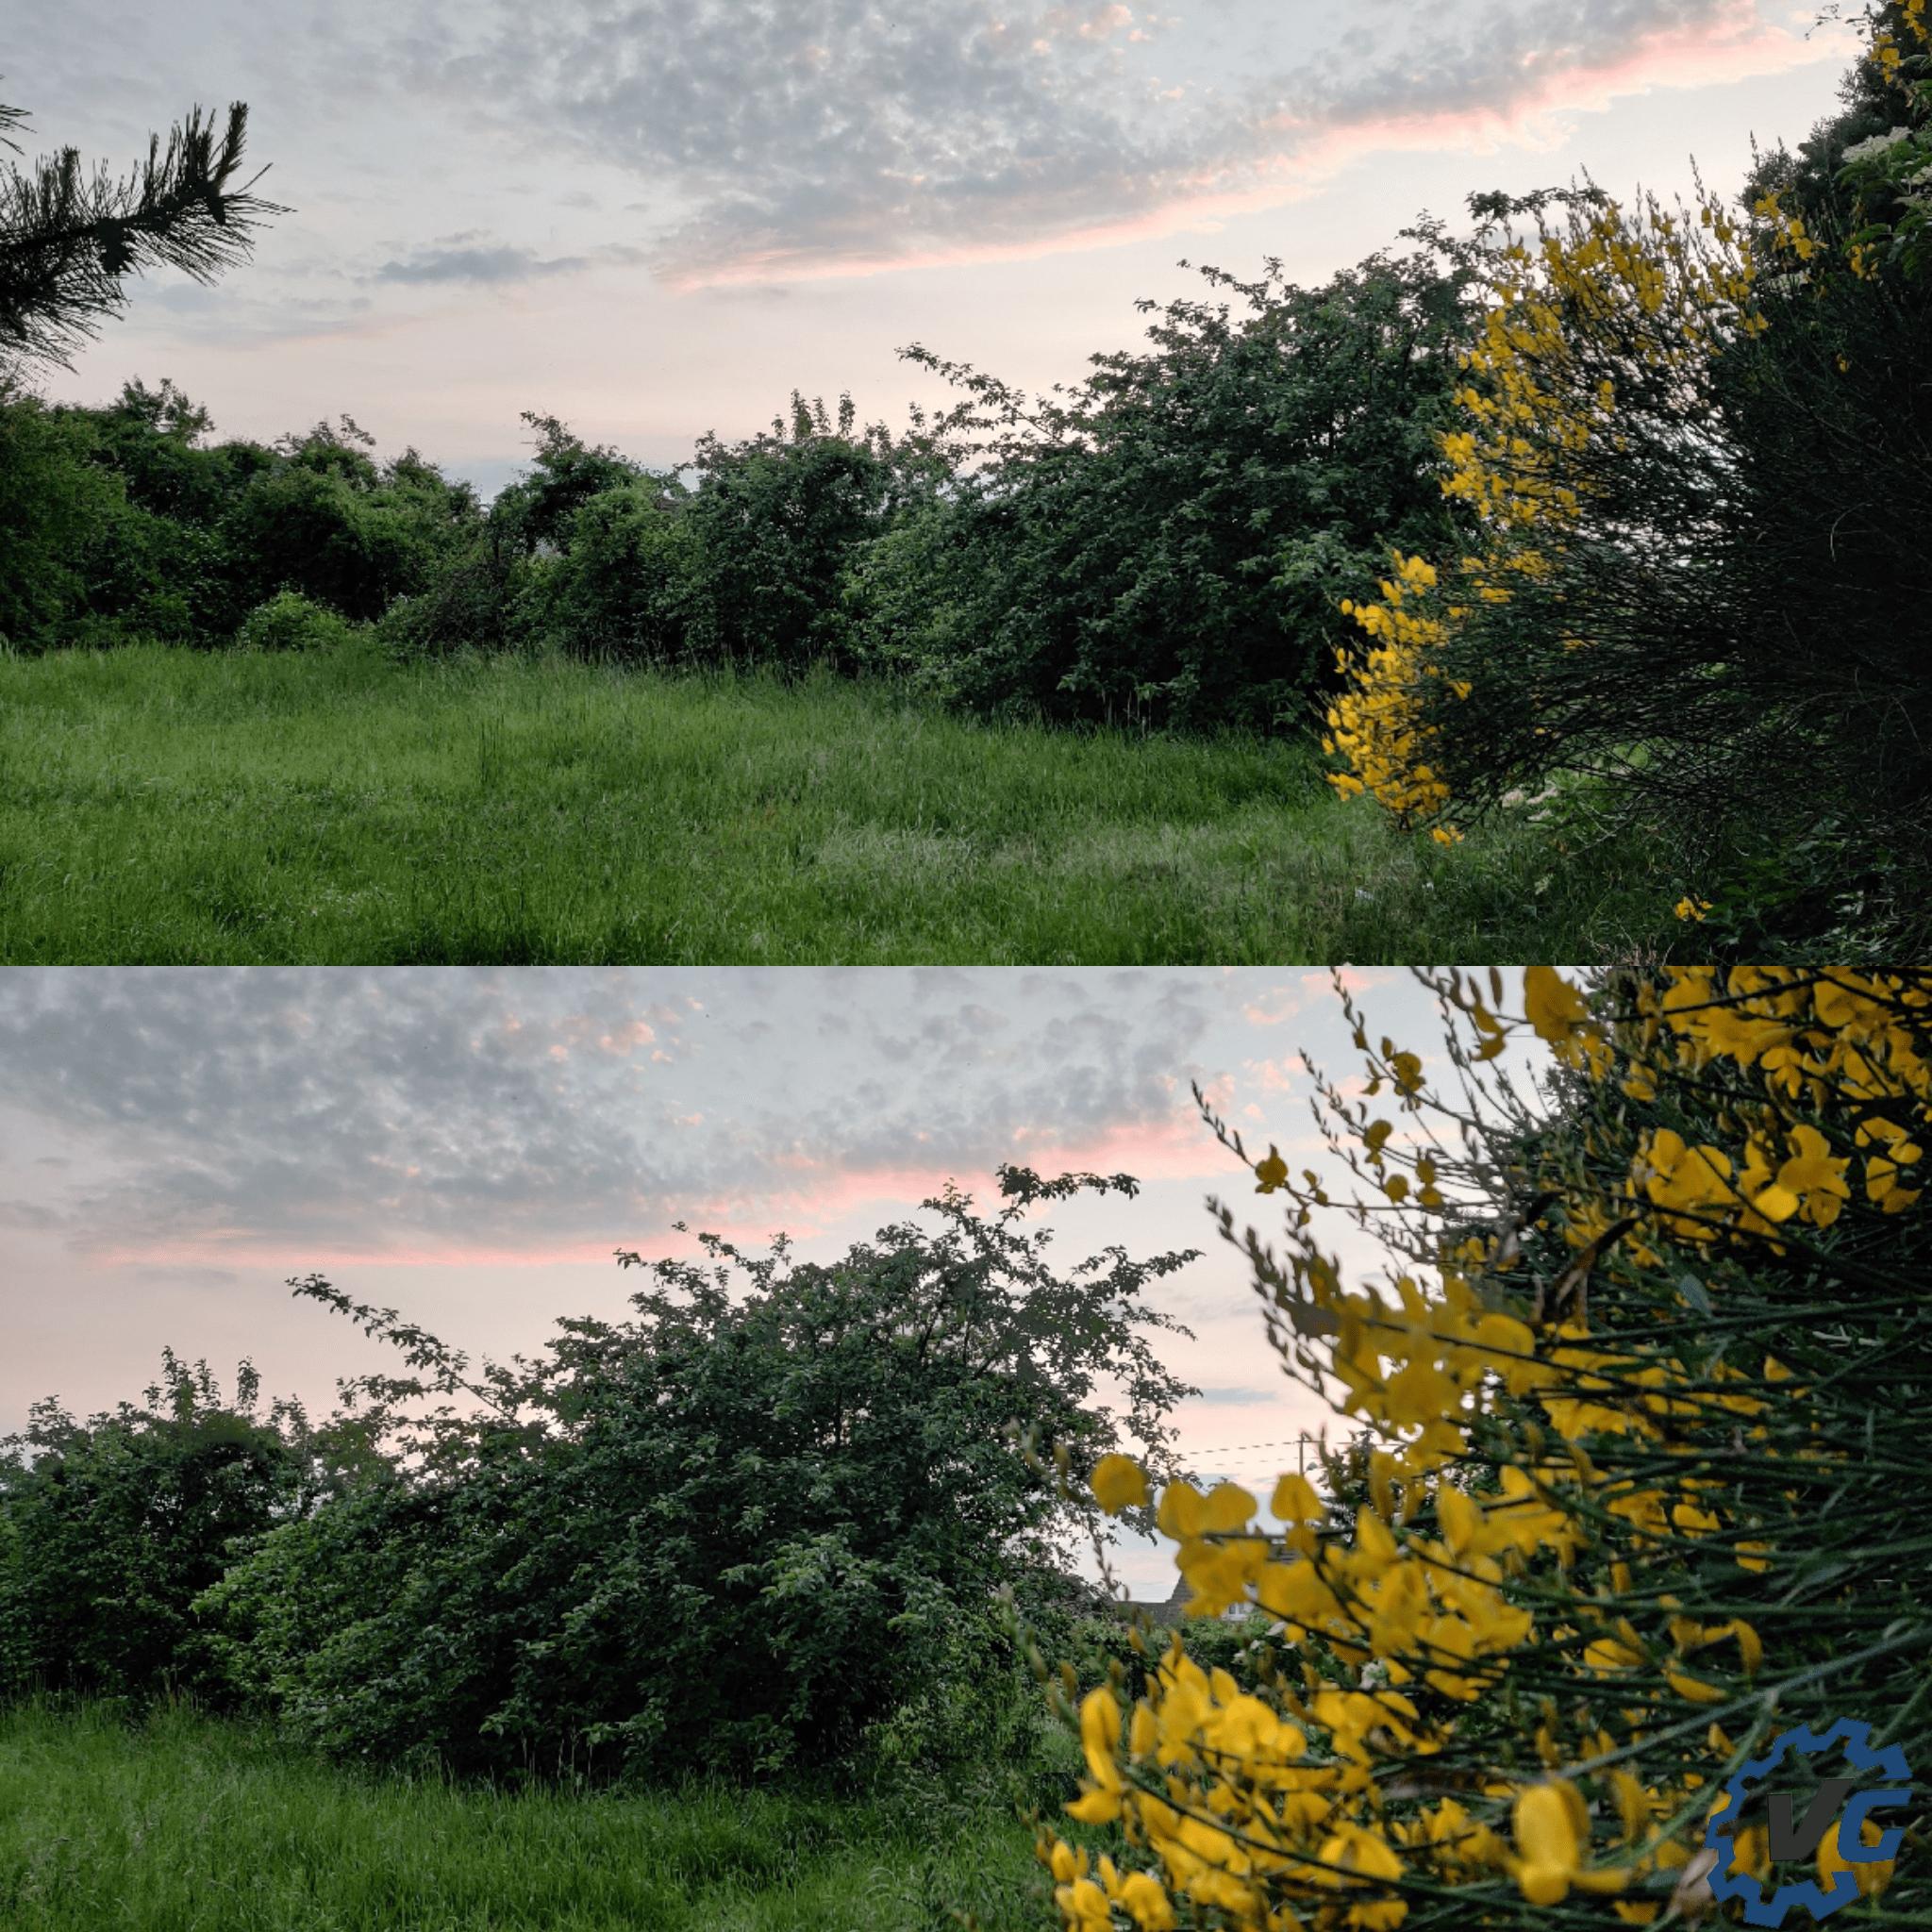 Oneplus 7 pro photo basse luminosité